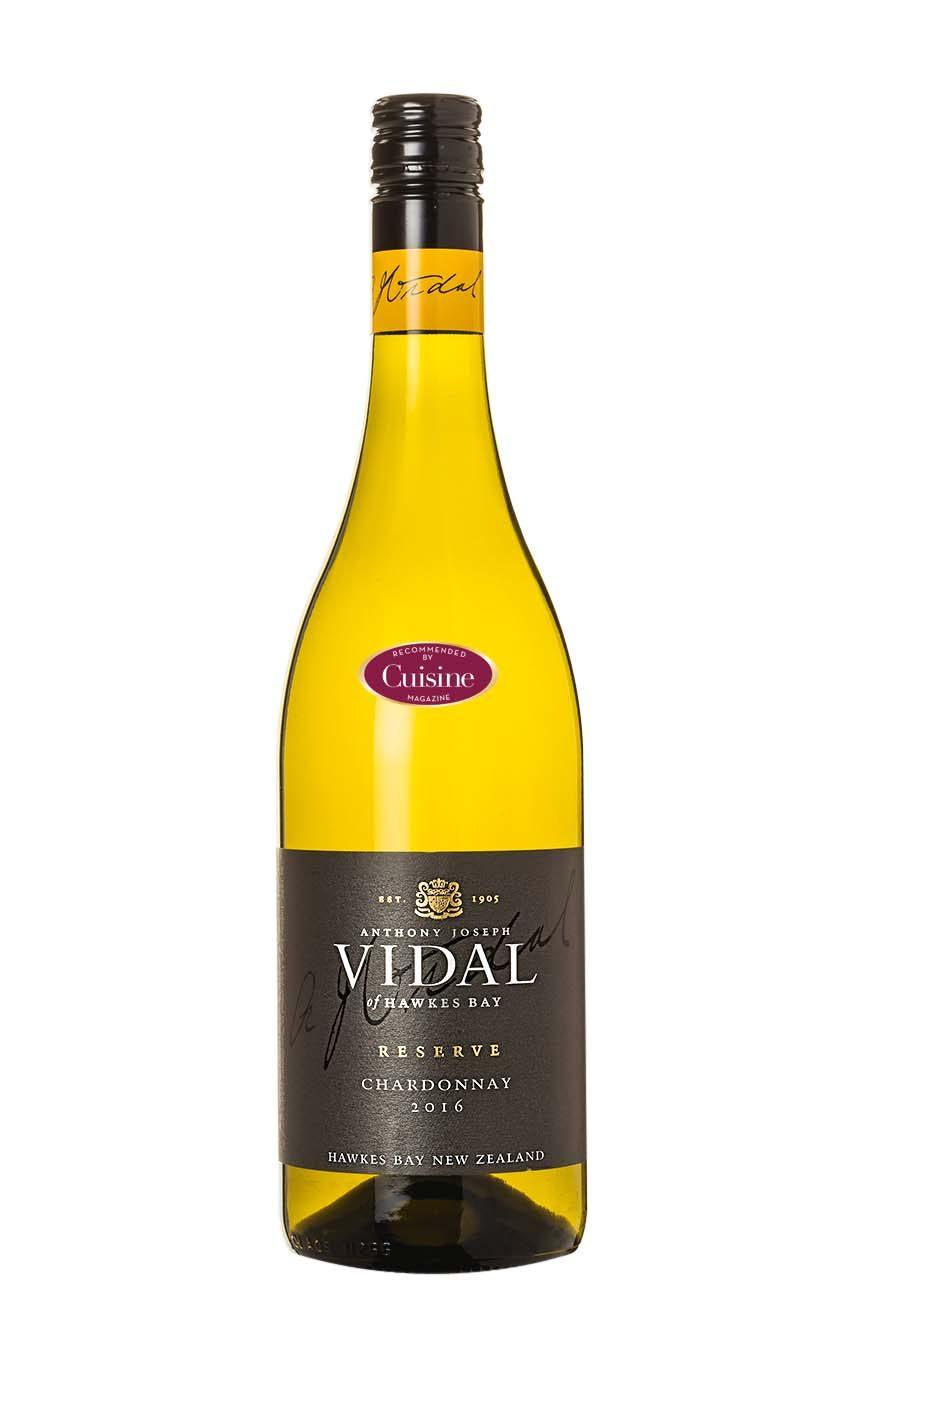 Vidal Reserve Chardonnay 2016